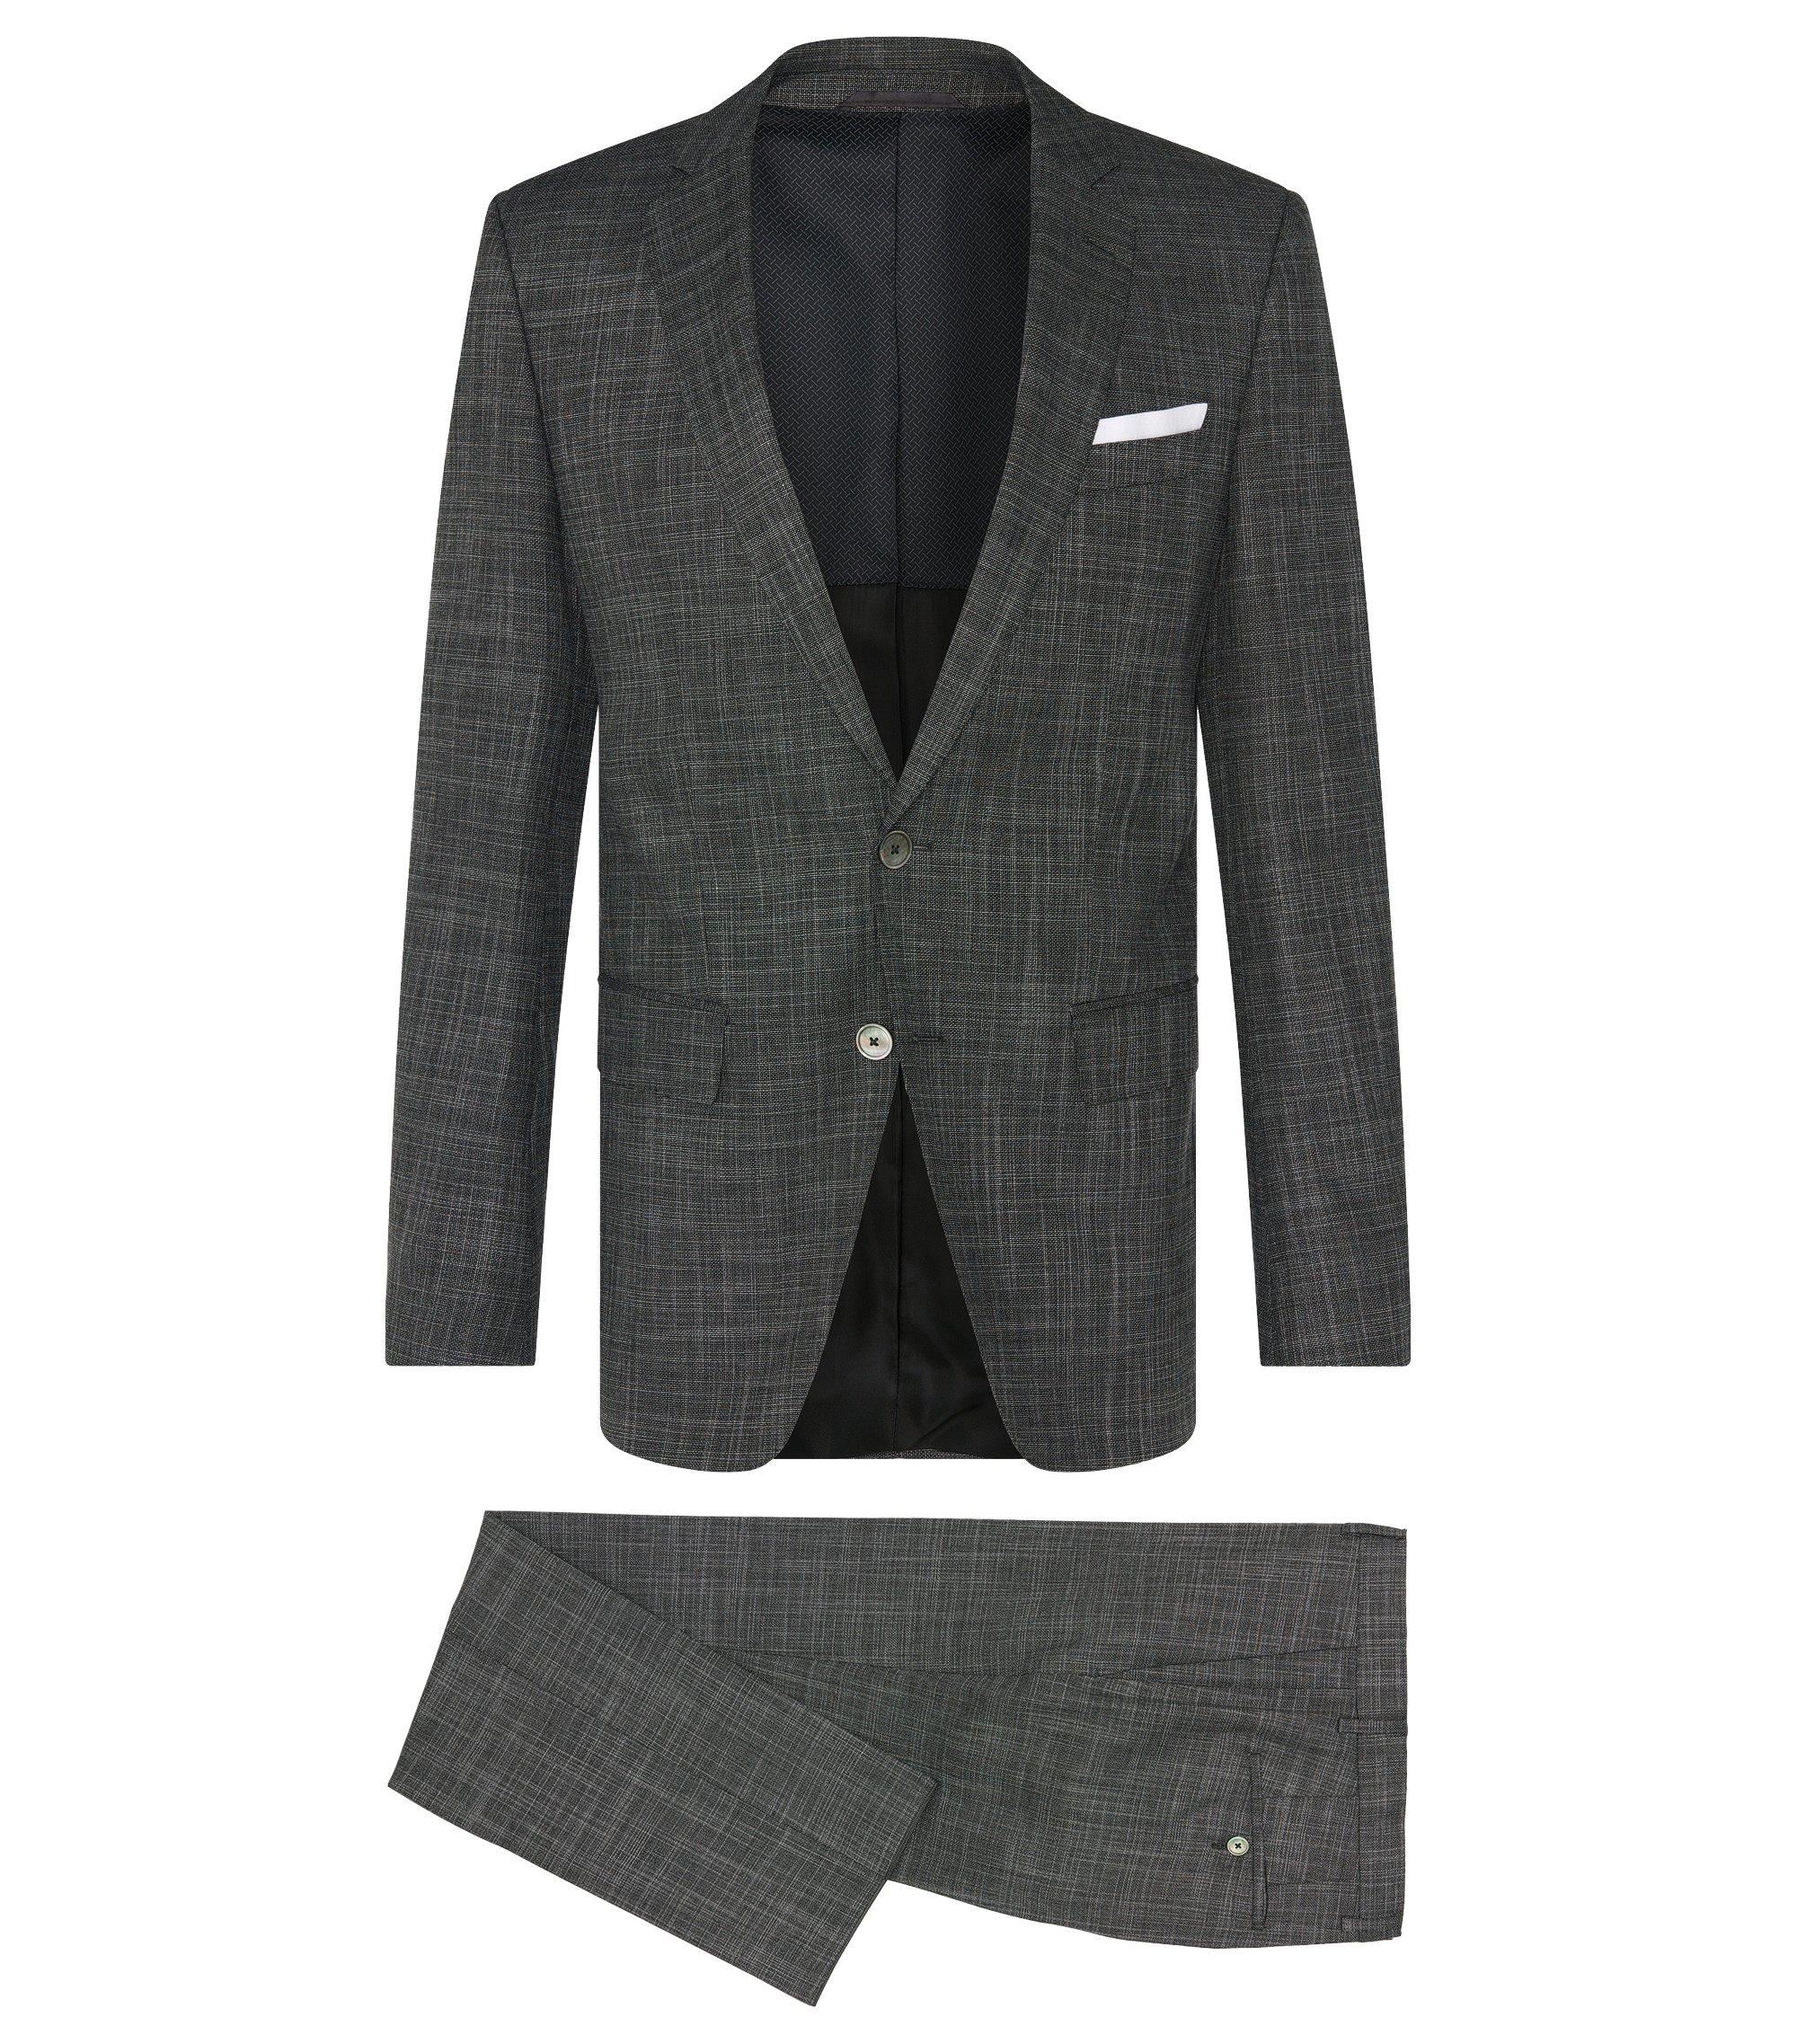 Stretch Wool Blend 3-Piece Suit, Slim Fit | Hutson/Gander WE, Charcoal